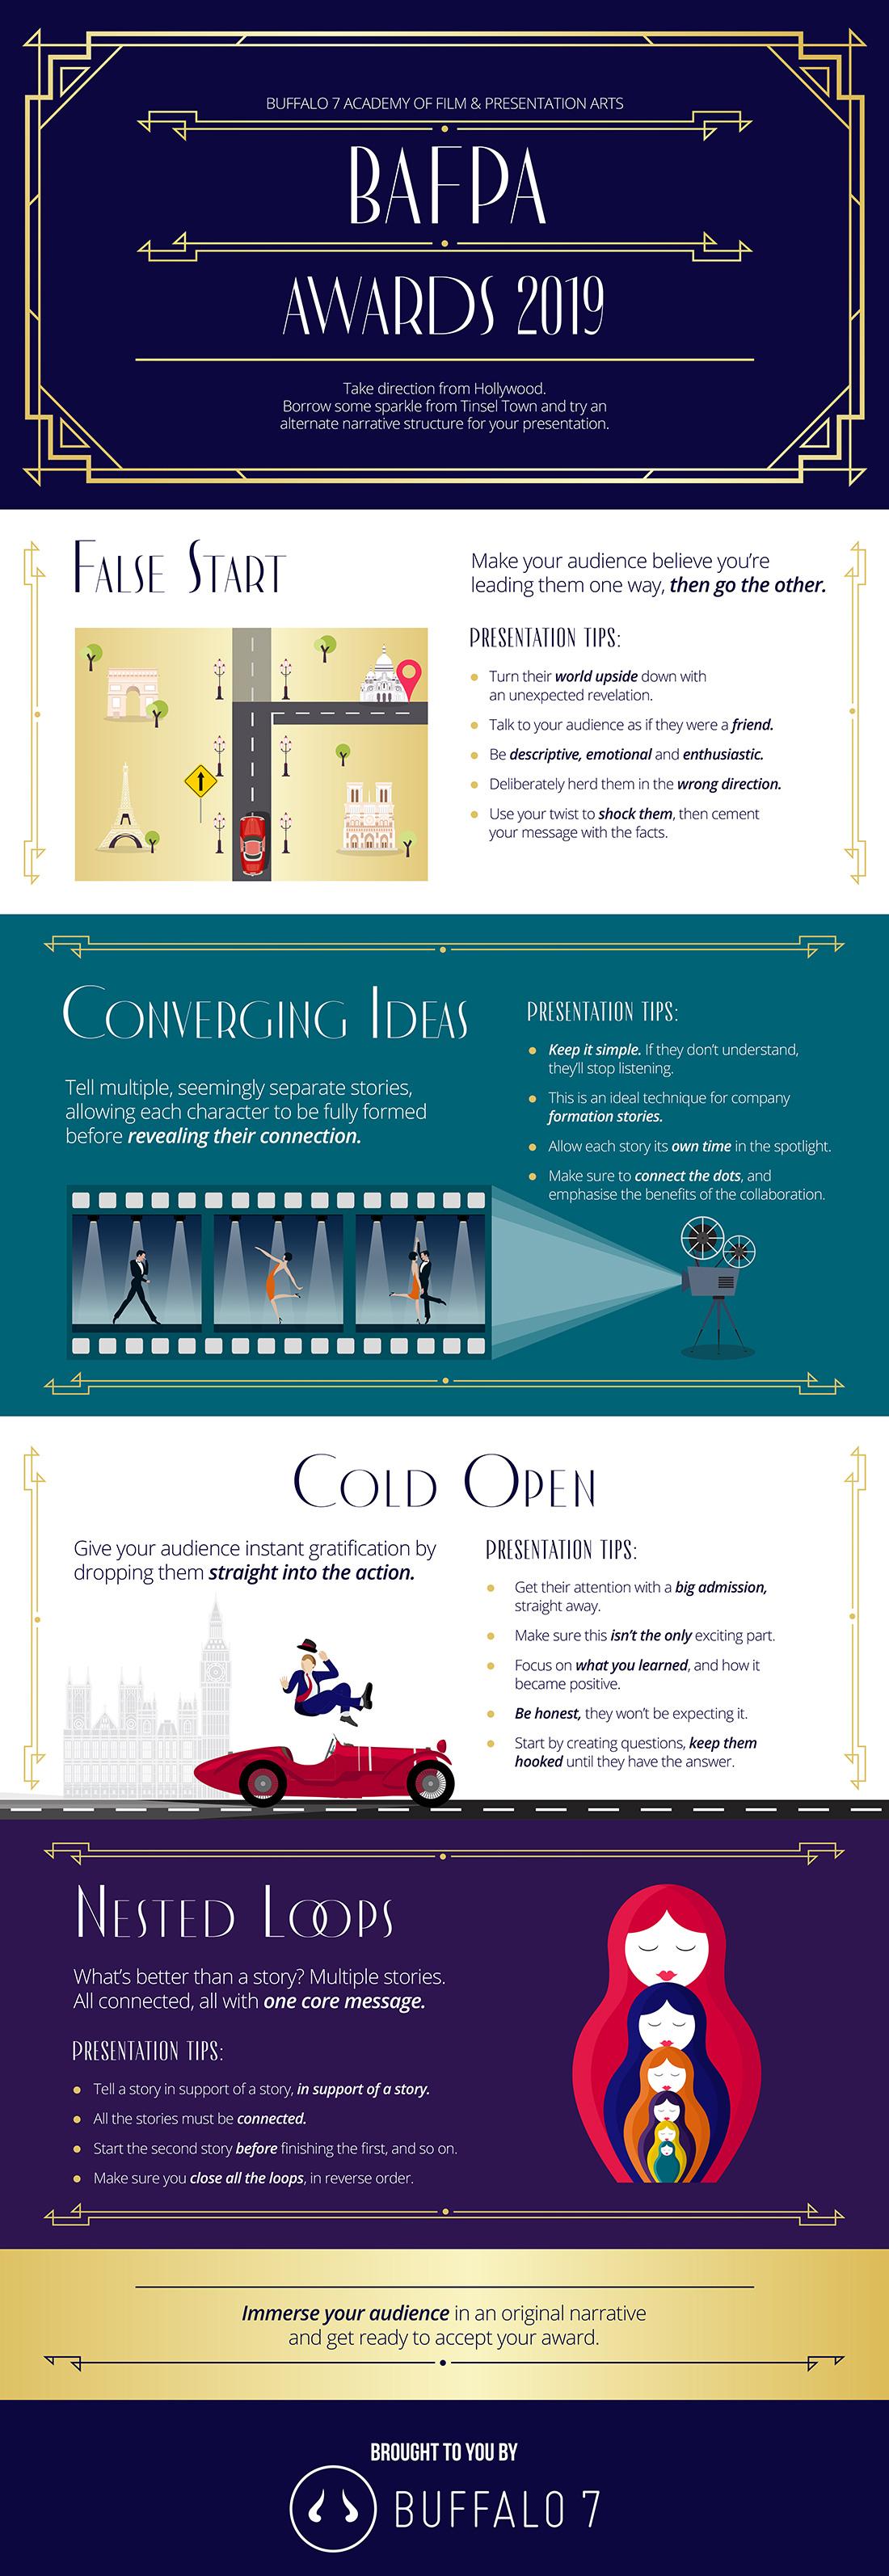 BAFPA - National Storytelling Week Infographic